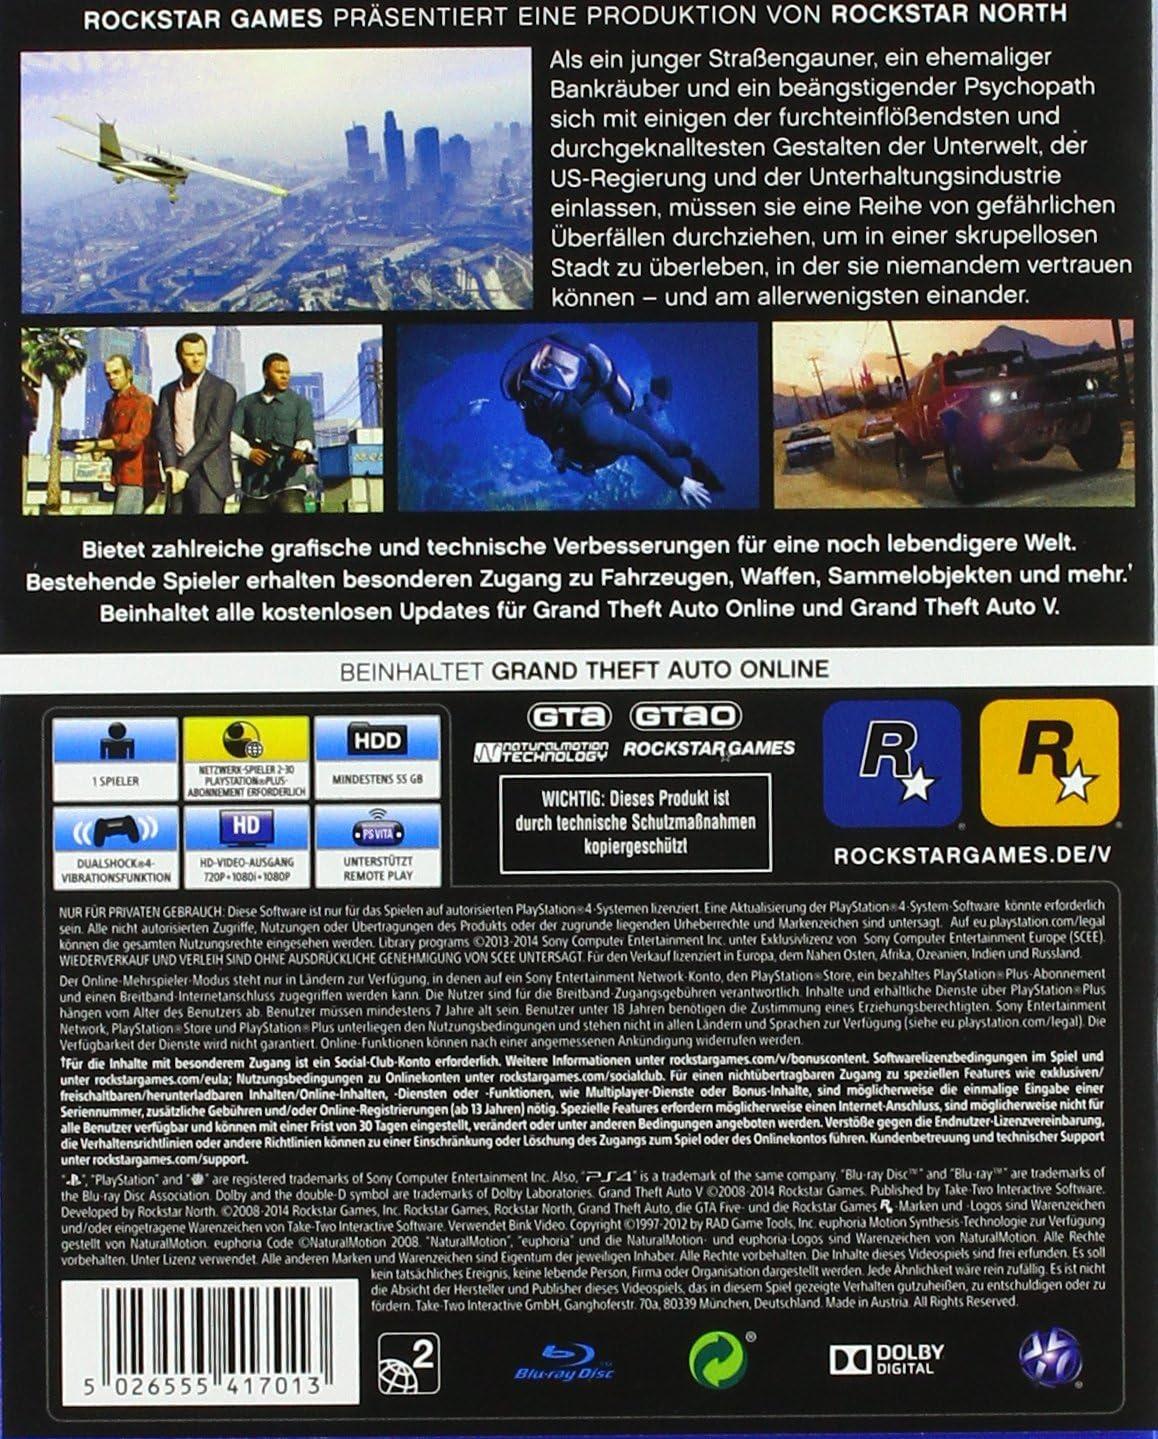 Amazon.com: GRAND THEFT AUTO 5 (GTA5): Video Games